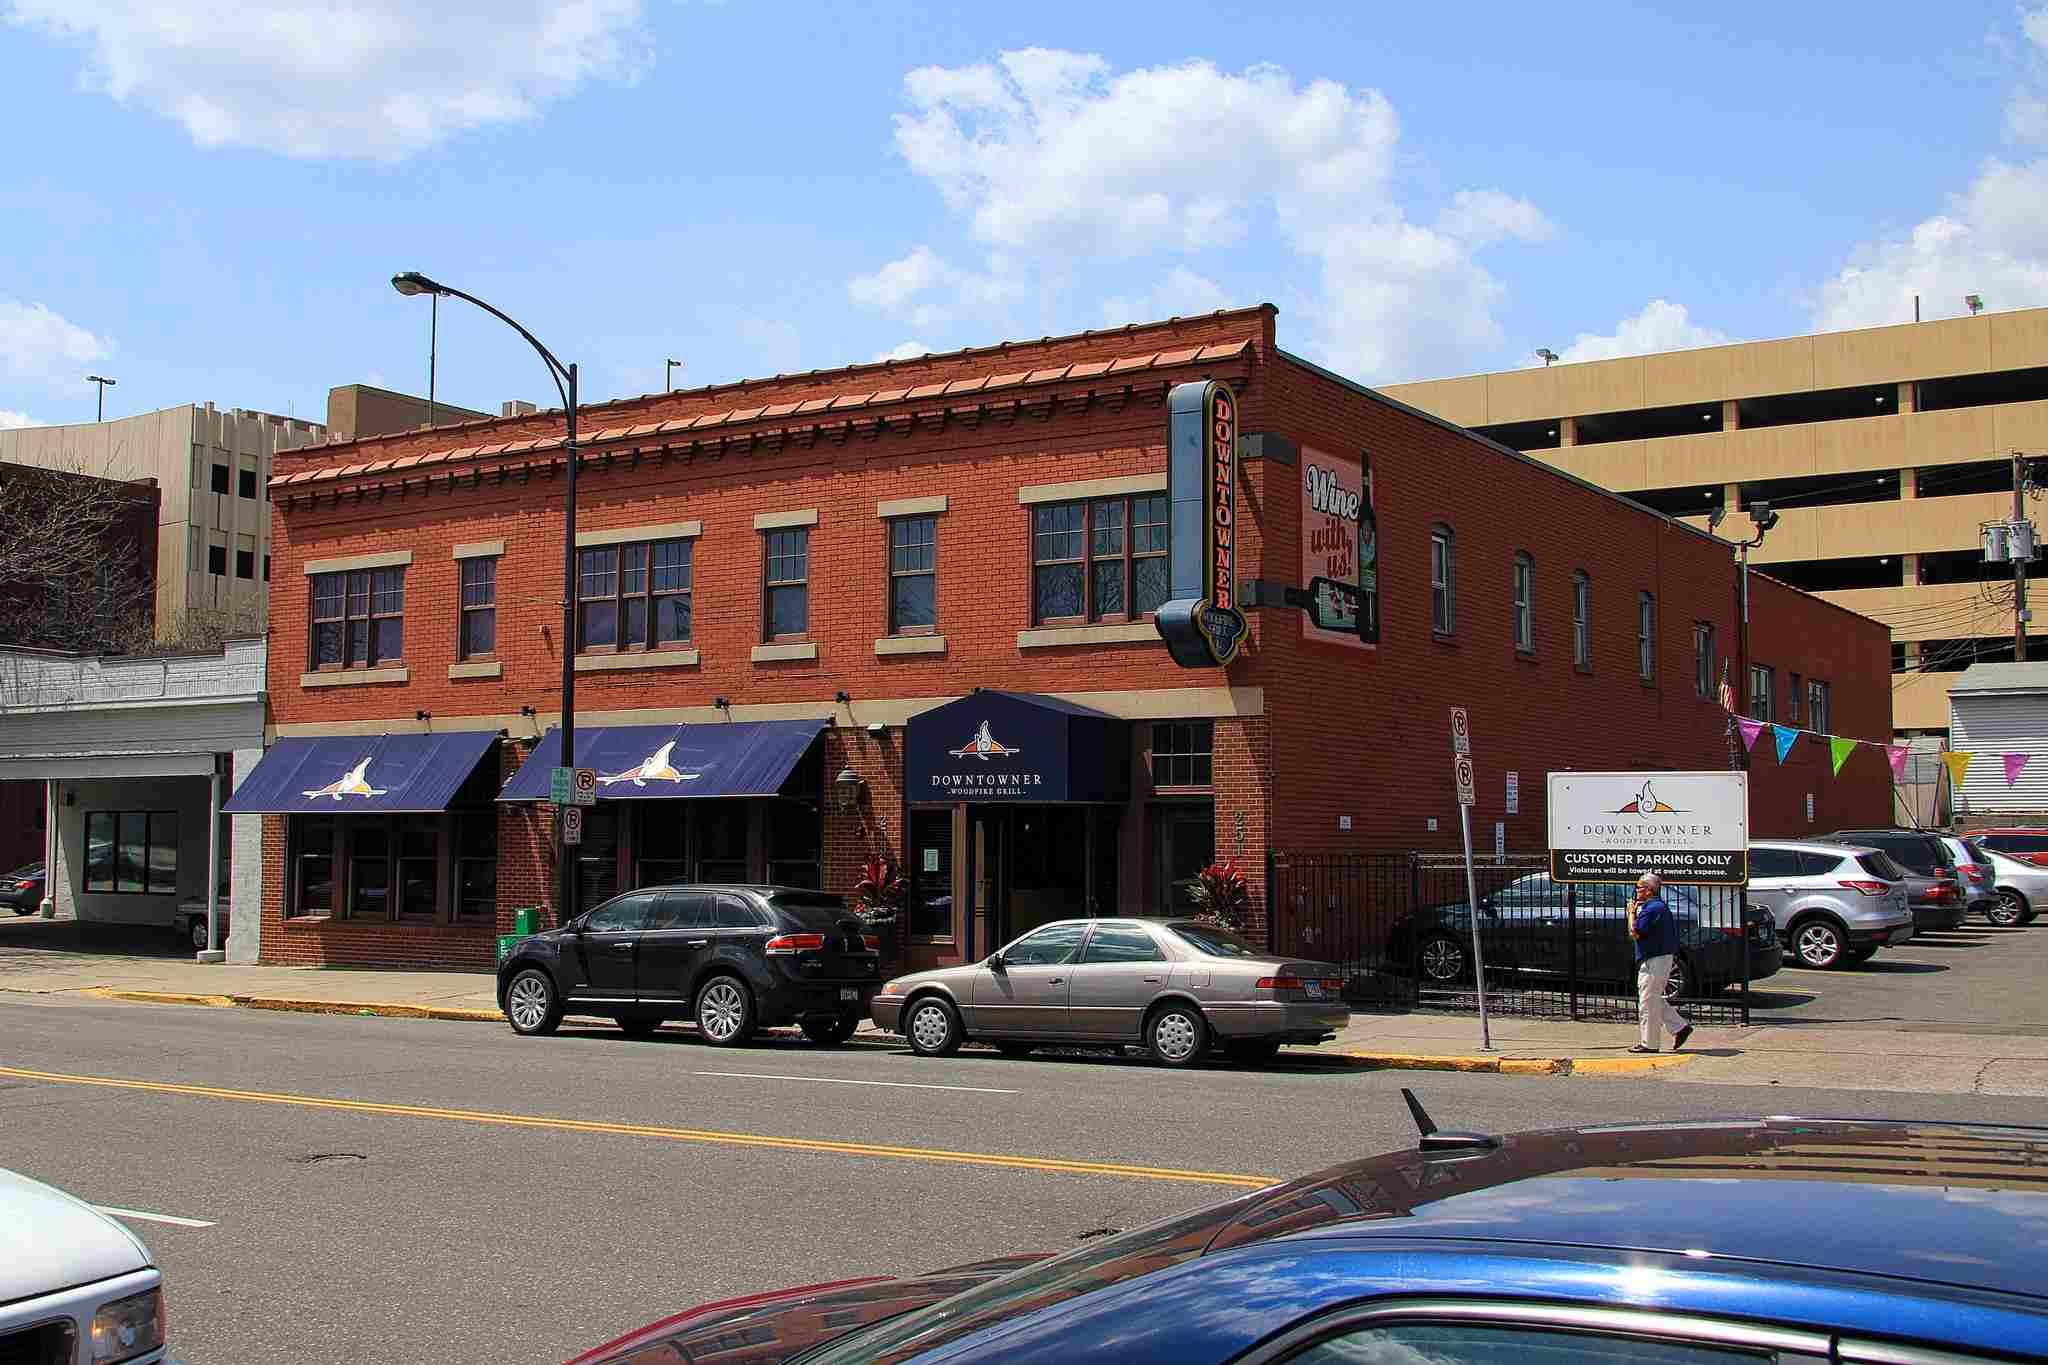 St Paul Restaurants And Bars Near Xcel Energy Center